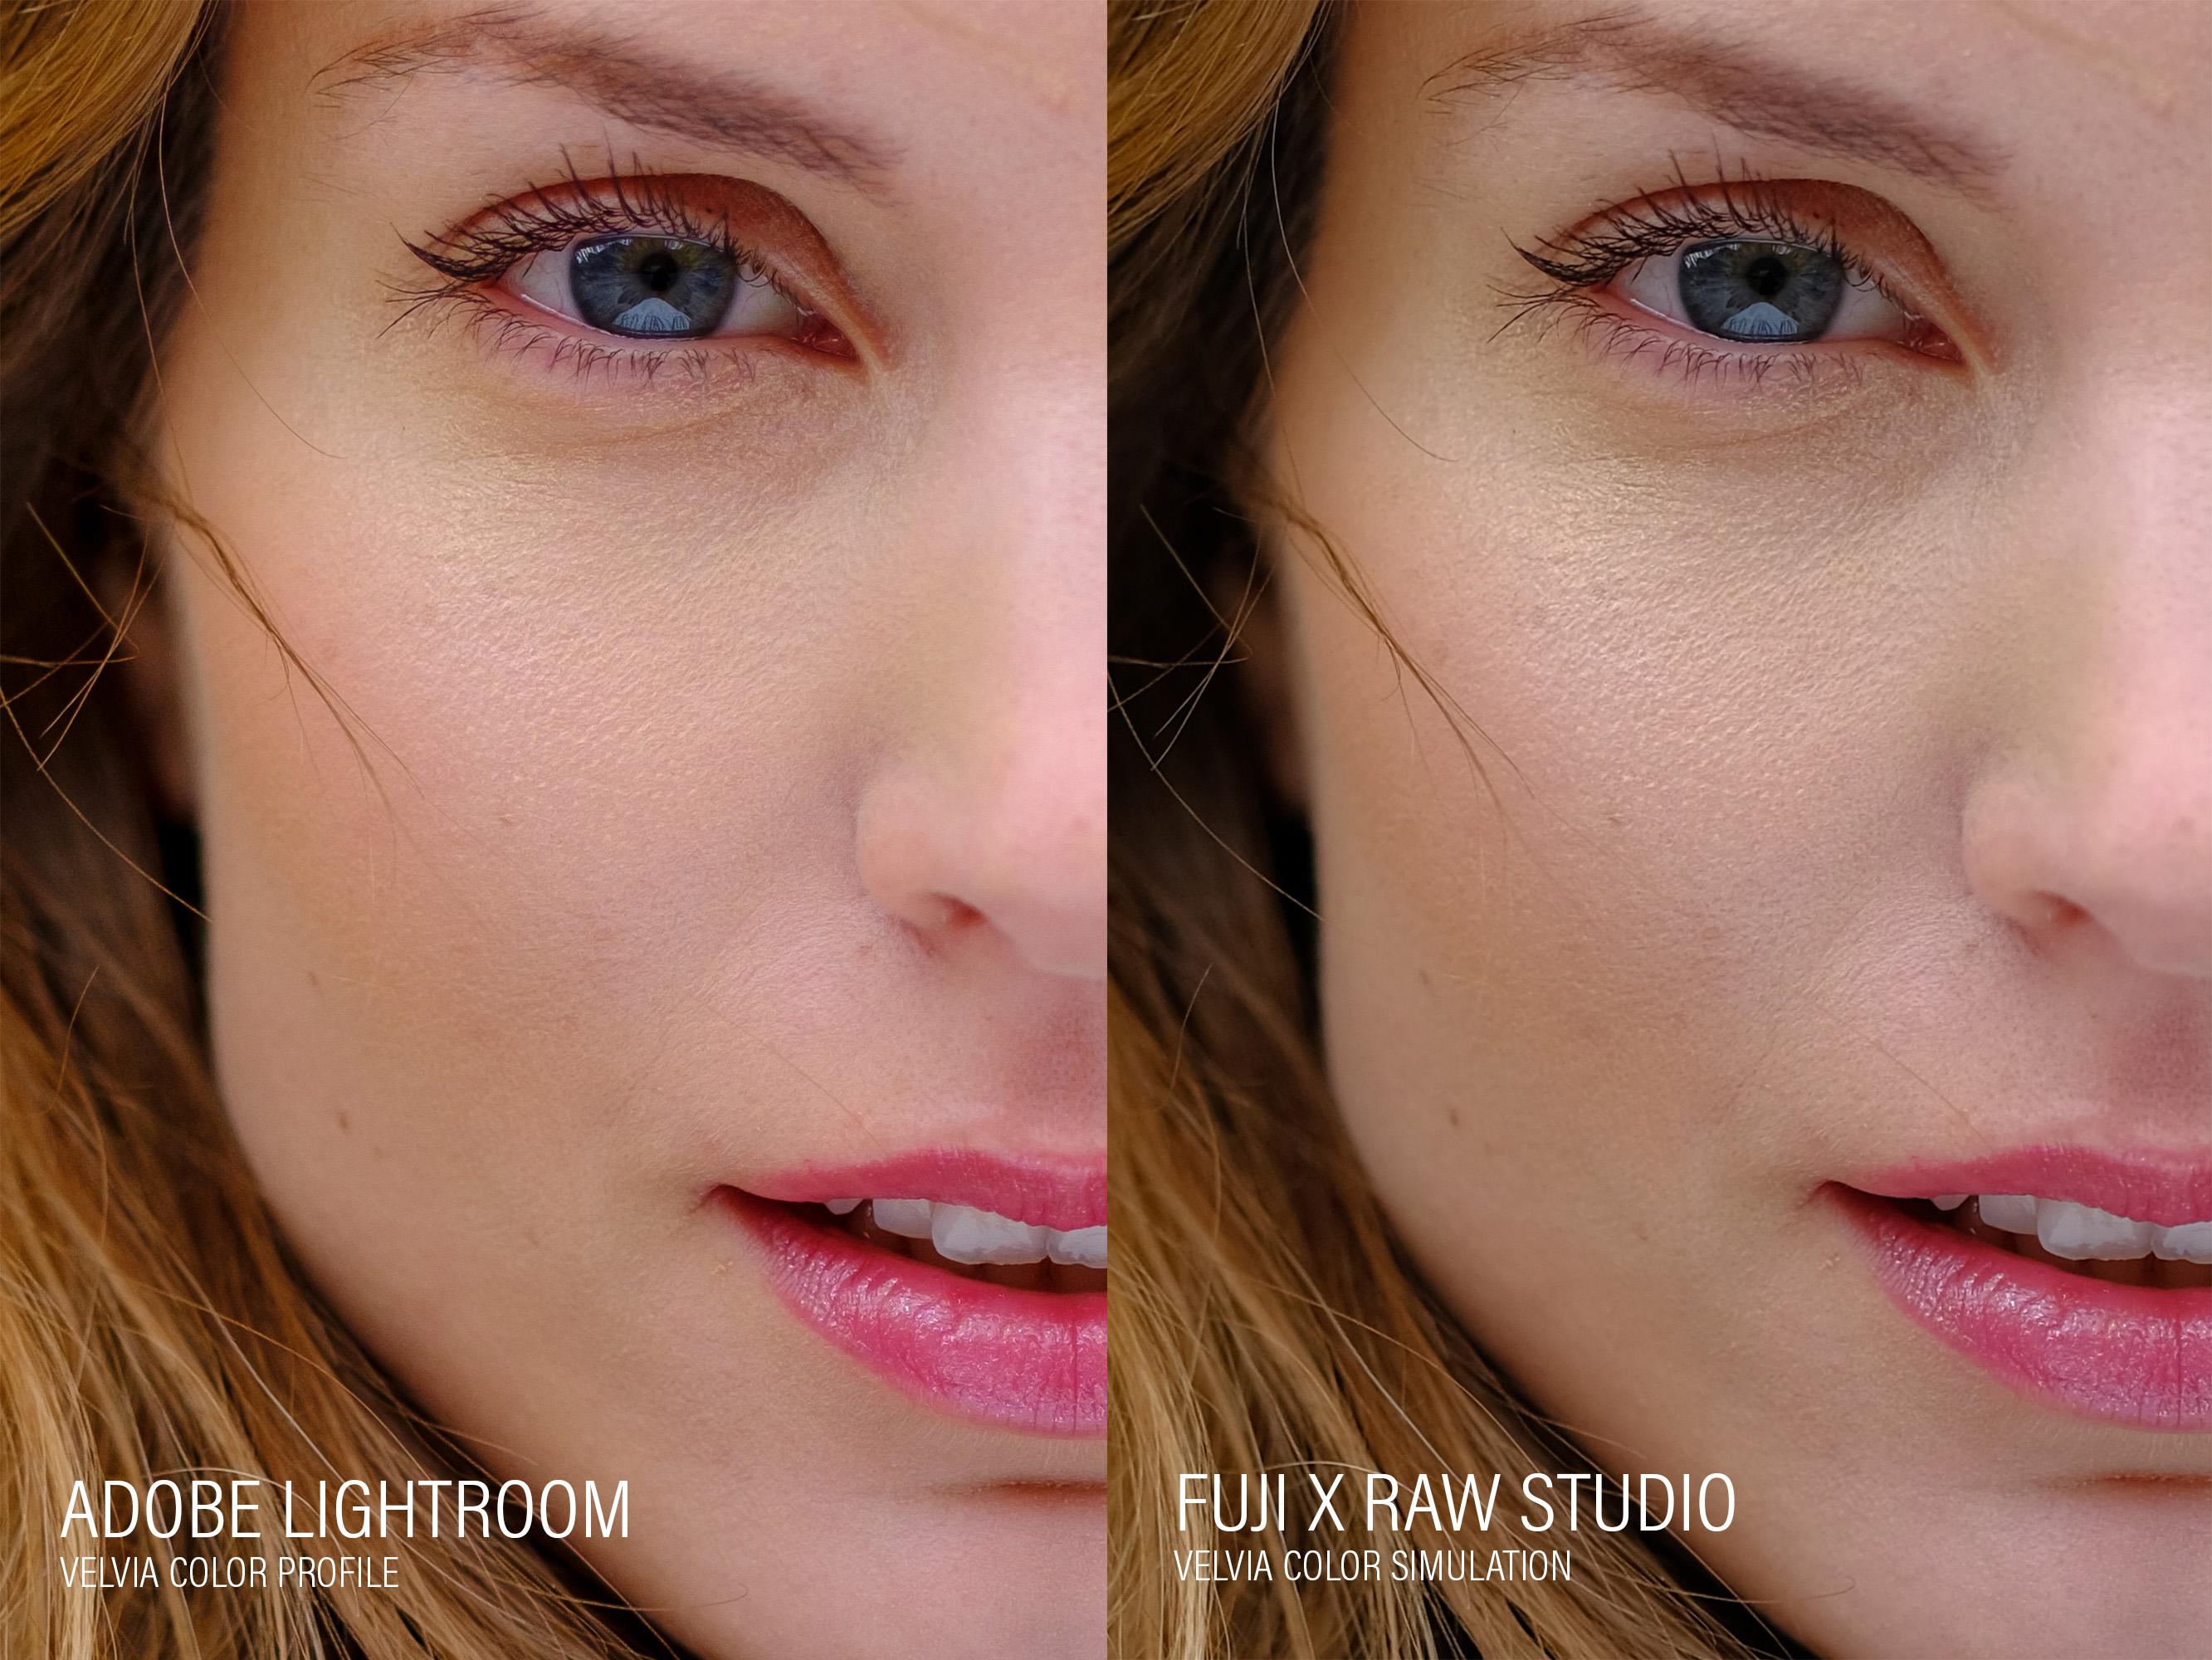 Fuji X Raw Studio use vs Lightroom: color rendering and details